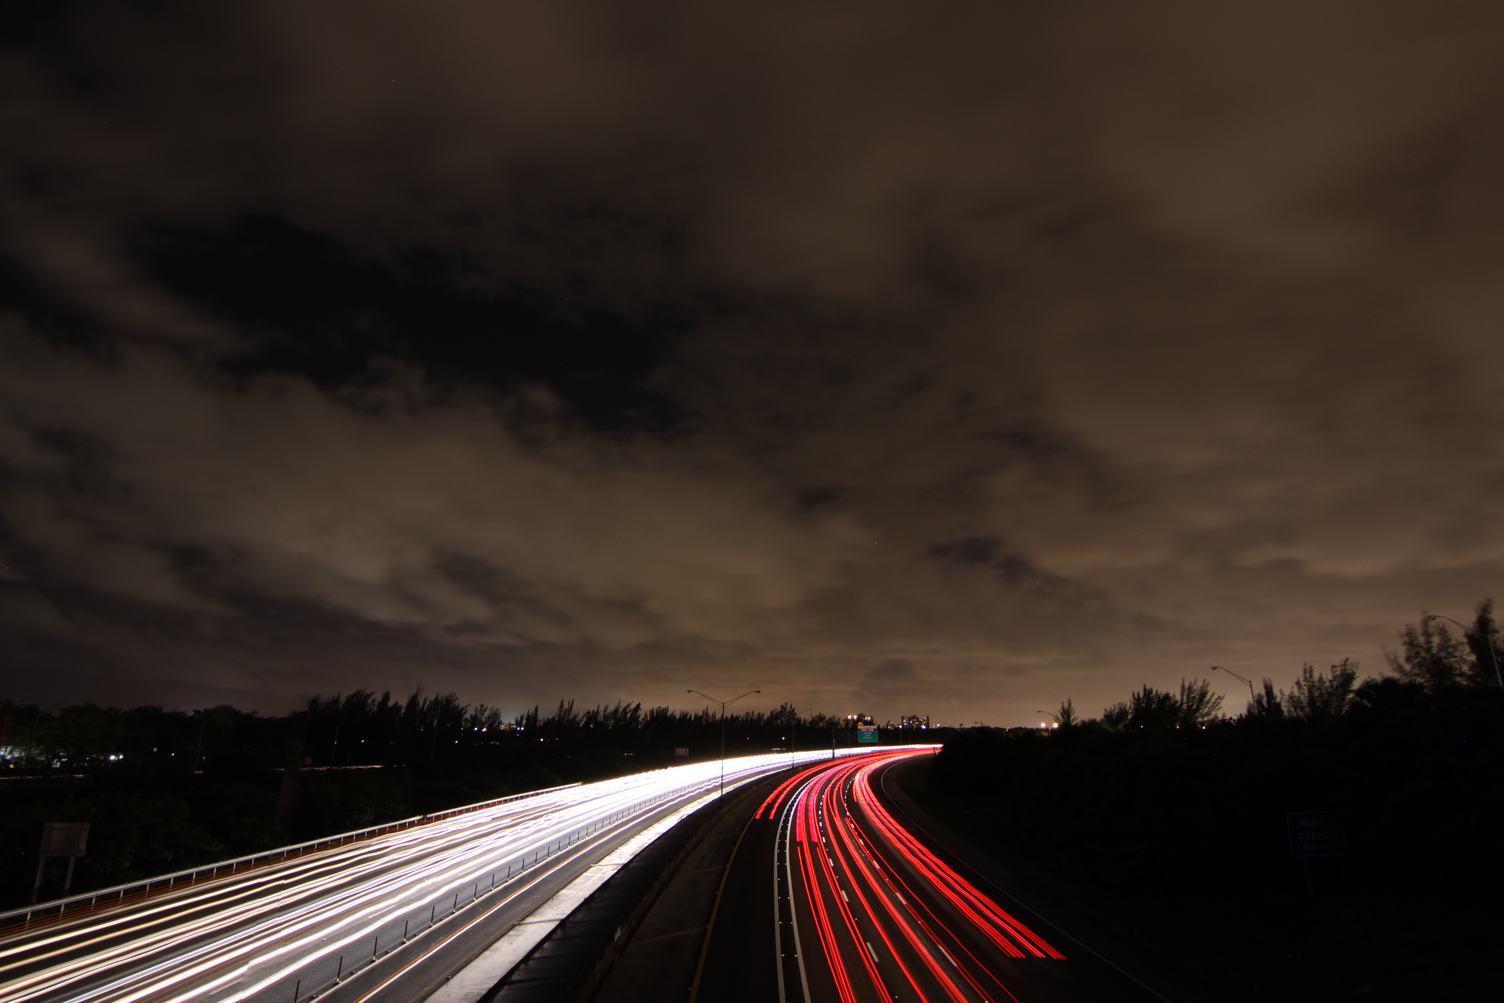 Long Exposure View of Traffic Lanes